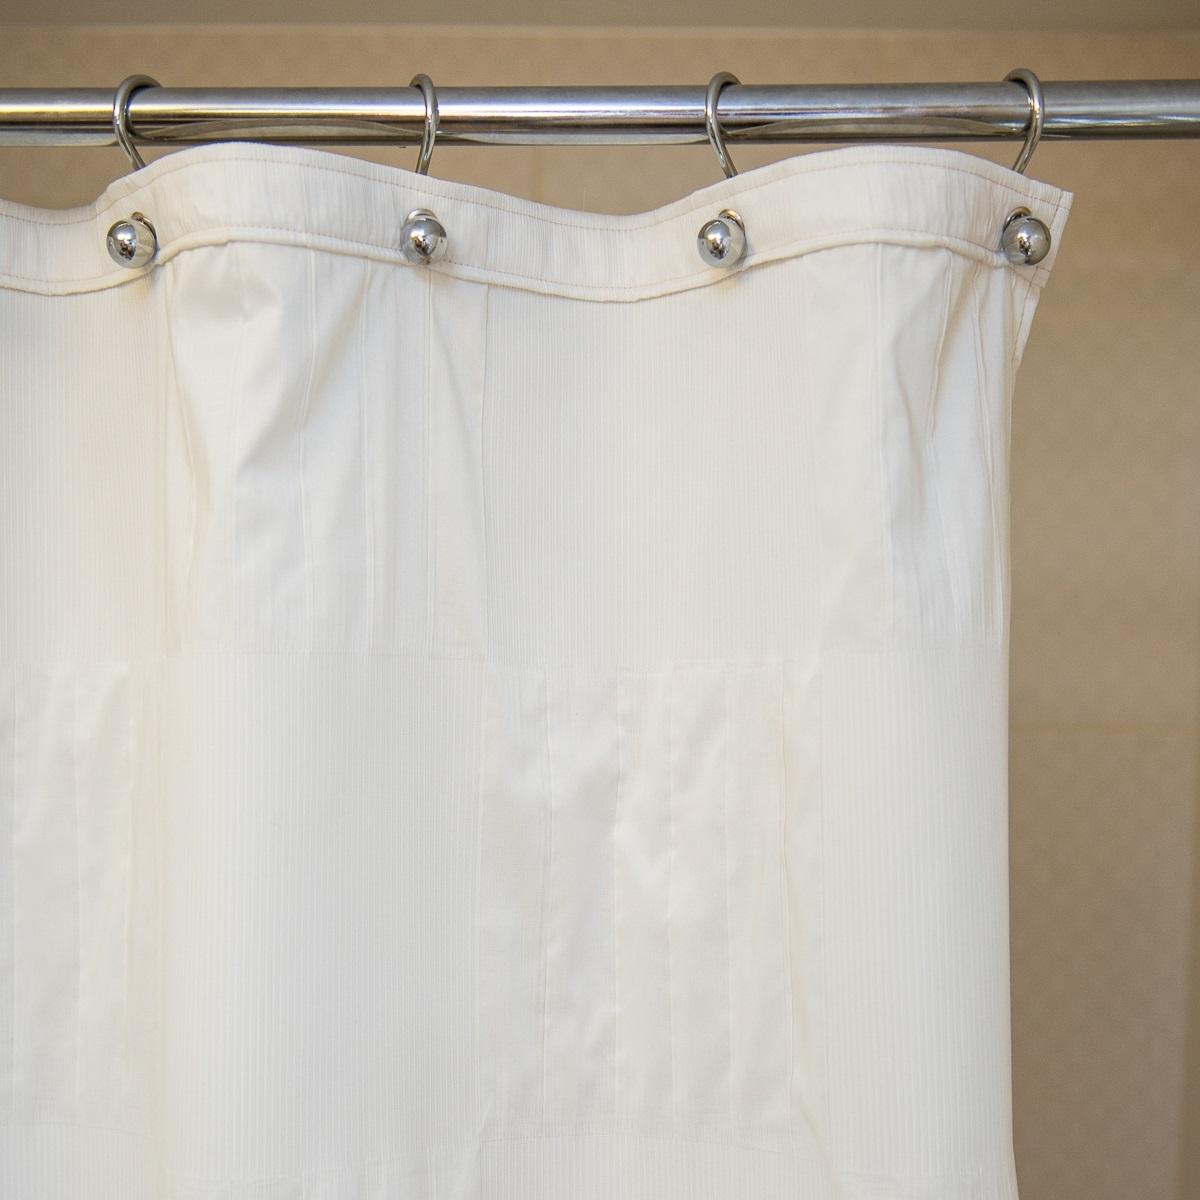 Шторки для ванной Шторка для ванной 180х200 Arti-Deco Cairo Beige и защитная шторка Liso Beige elitnaya-shtorka-dlya-vannoy-180h200-cairo-beige-ot-arti-deco-ispaniya.jpg